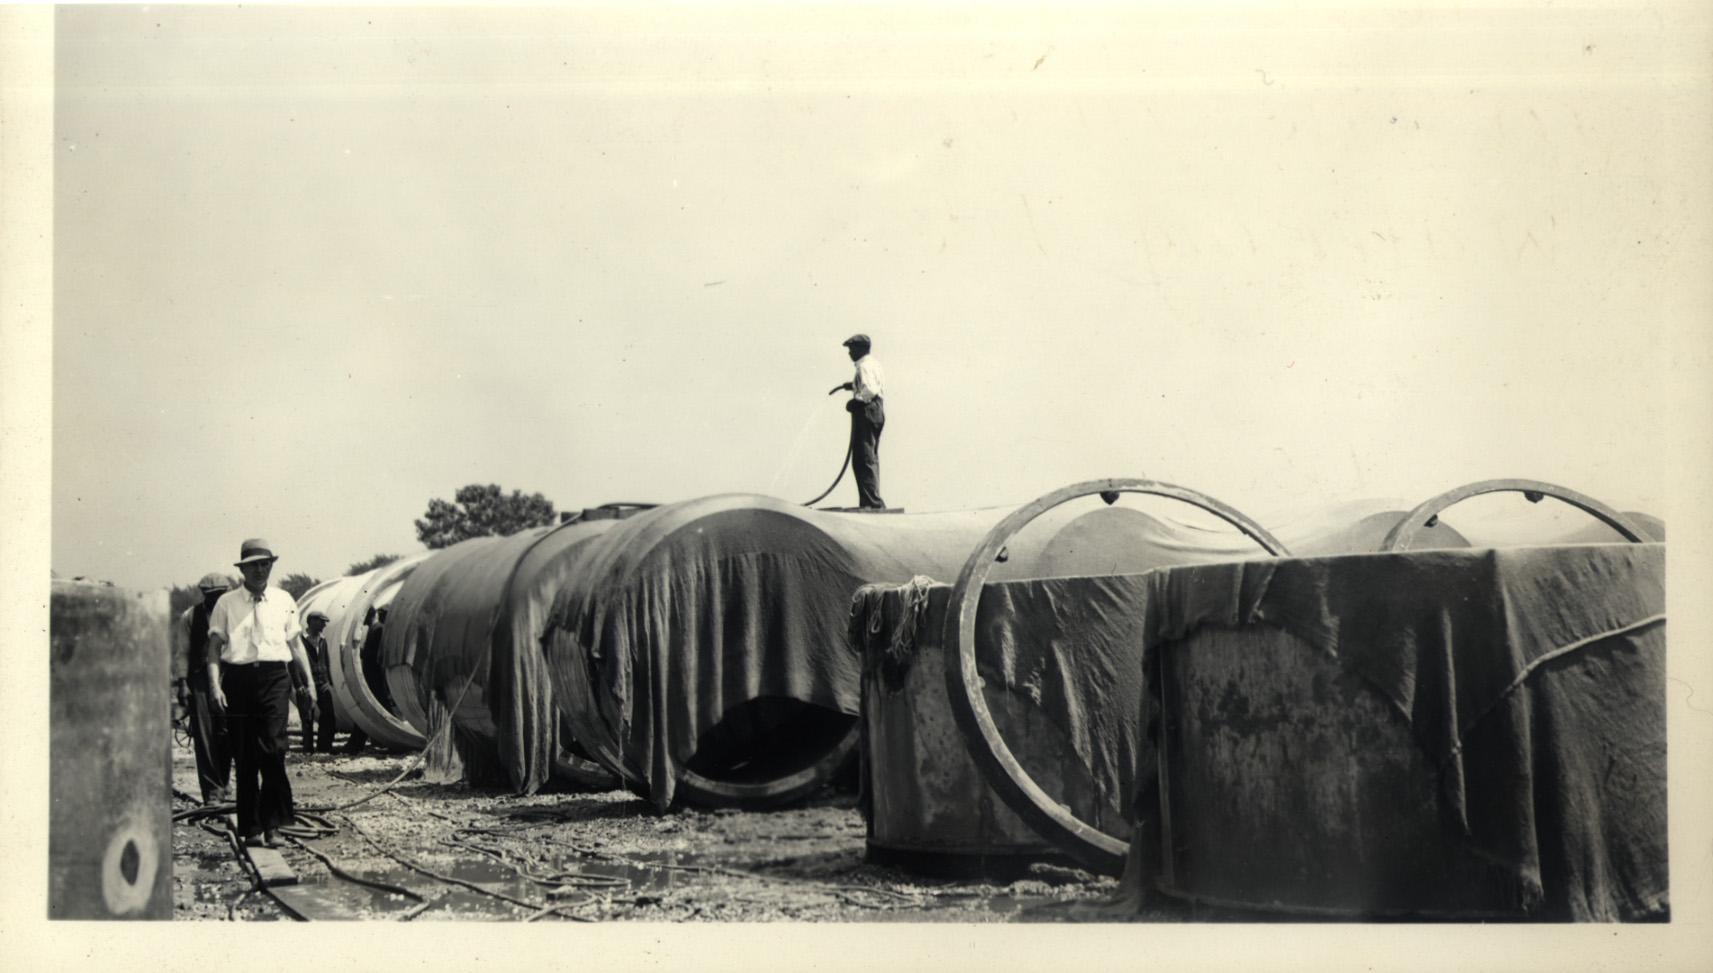 103rd Street and Rockwell Street, Pipe Yard, watering pipe, June 16, 1936